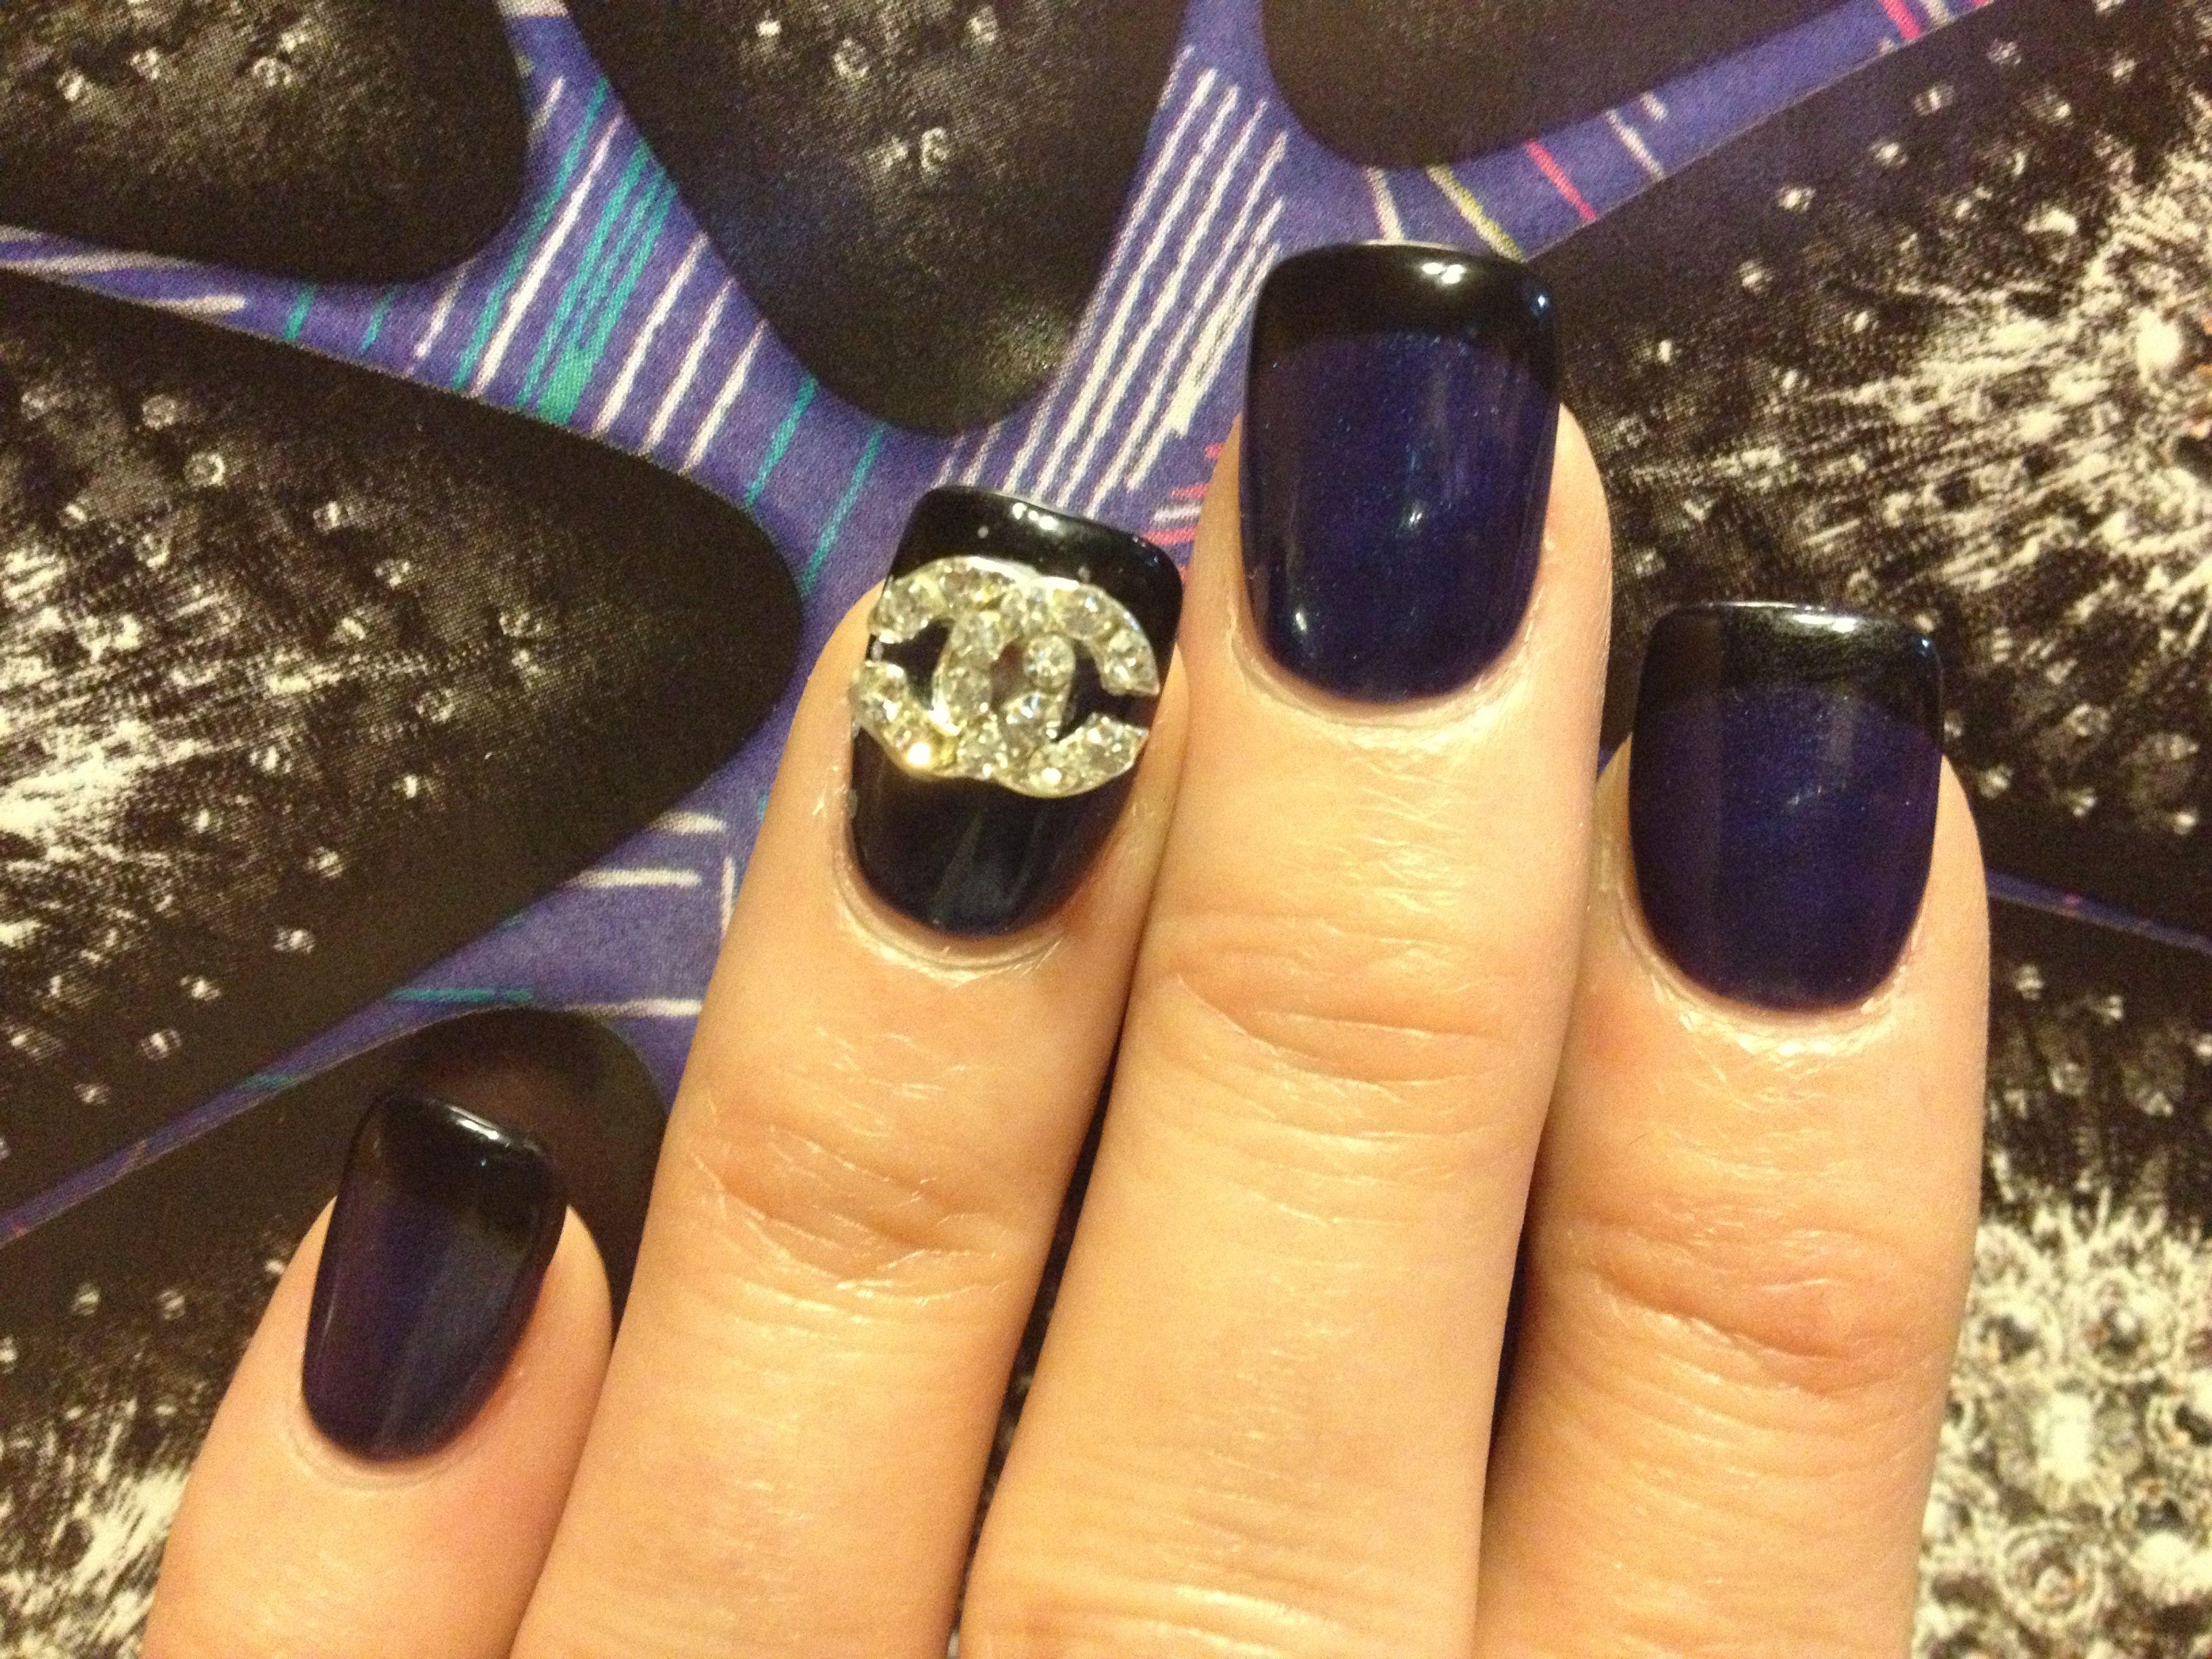 Encantador Chanel Uñas Tabú Polaco Inspiración - Ideas de Diseño de ...